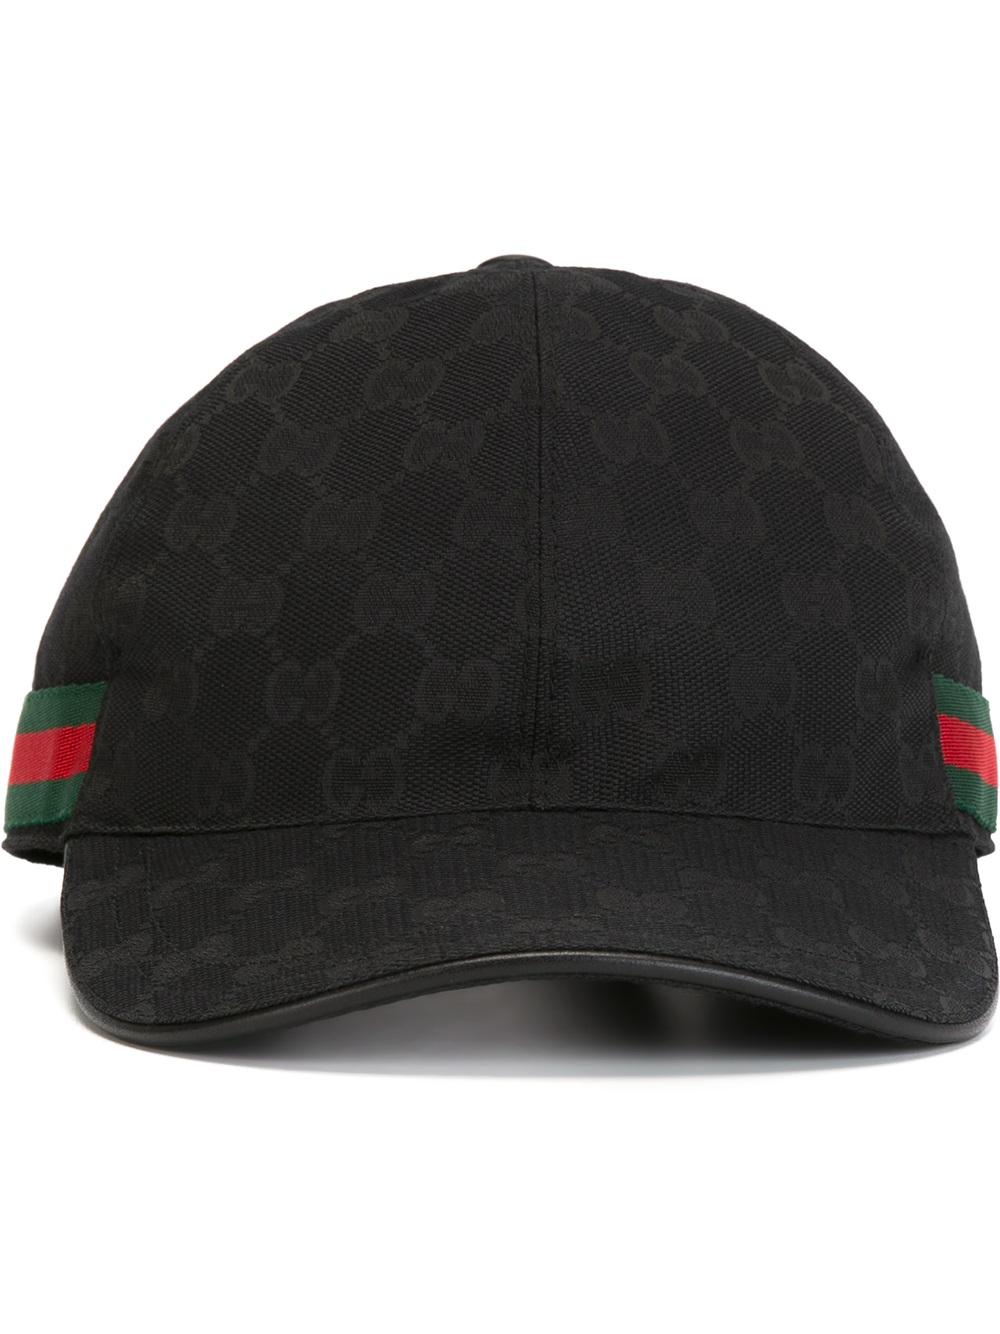 1741bd0050b Gucci Canvas Baseball Hat - Hat HD Image Ukjugs.Org